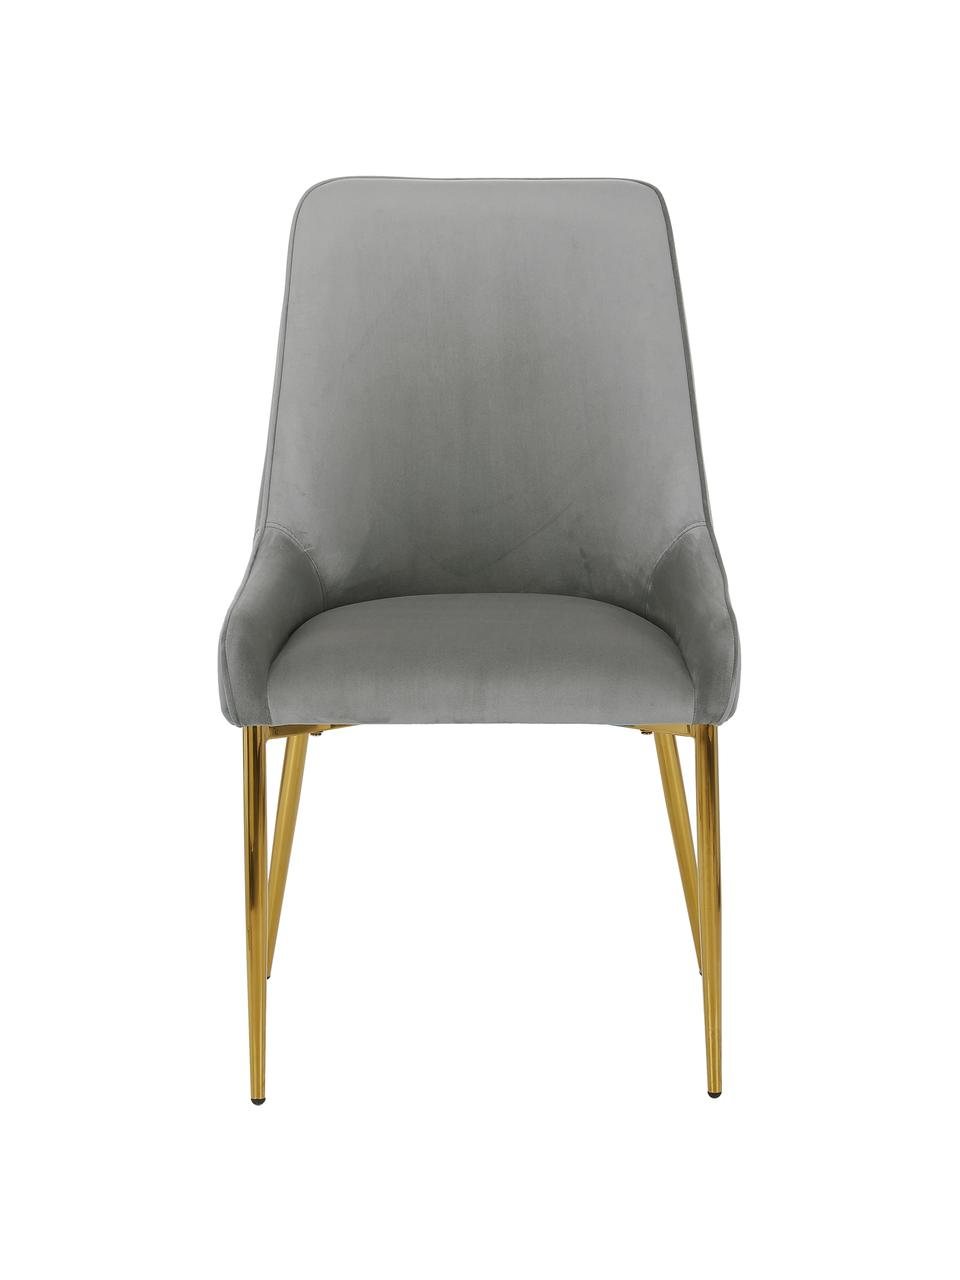 Sedia imbottita in velluto grigio Ava, Rivestimento: velluto (100% poliestere), Gambe: metallo zincato, Velluto grigio, Larg. 53 x Prof. 60 cm